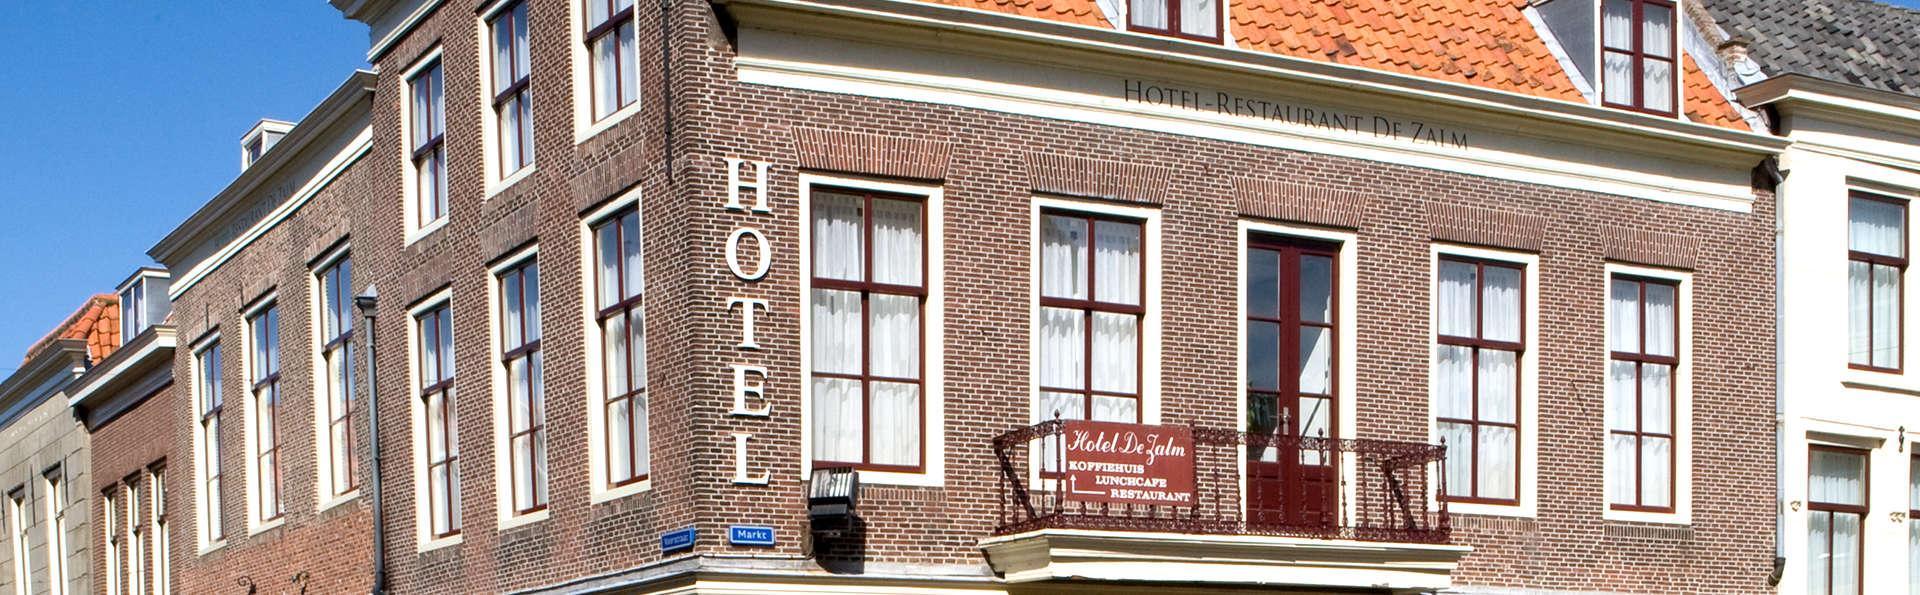 Fletcher Hotel-Restaurant De Zalm - Edit_Front.jpg